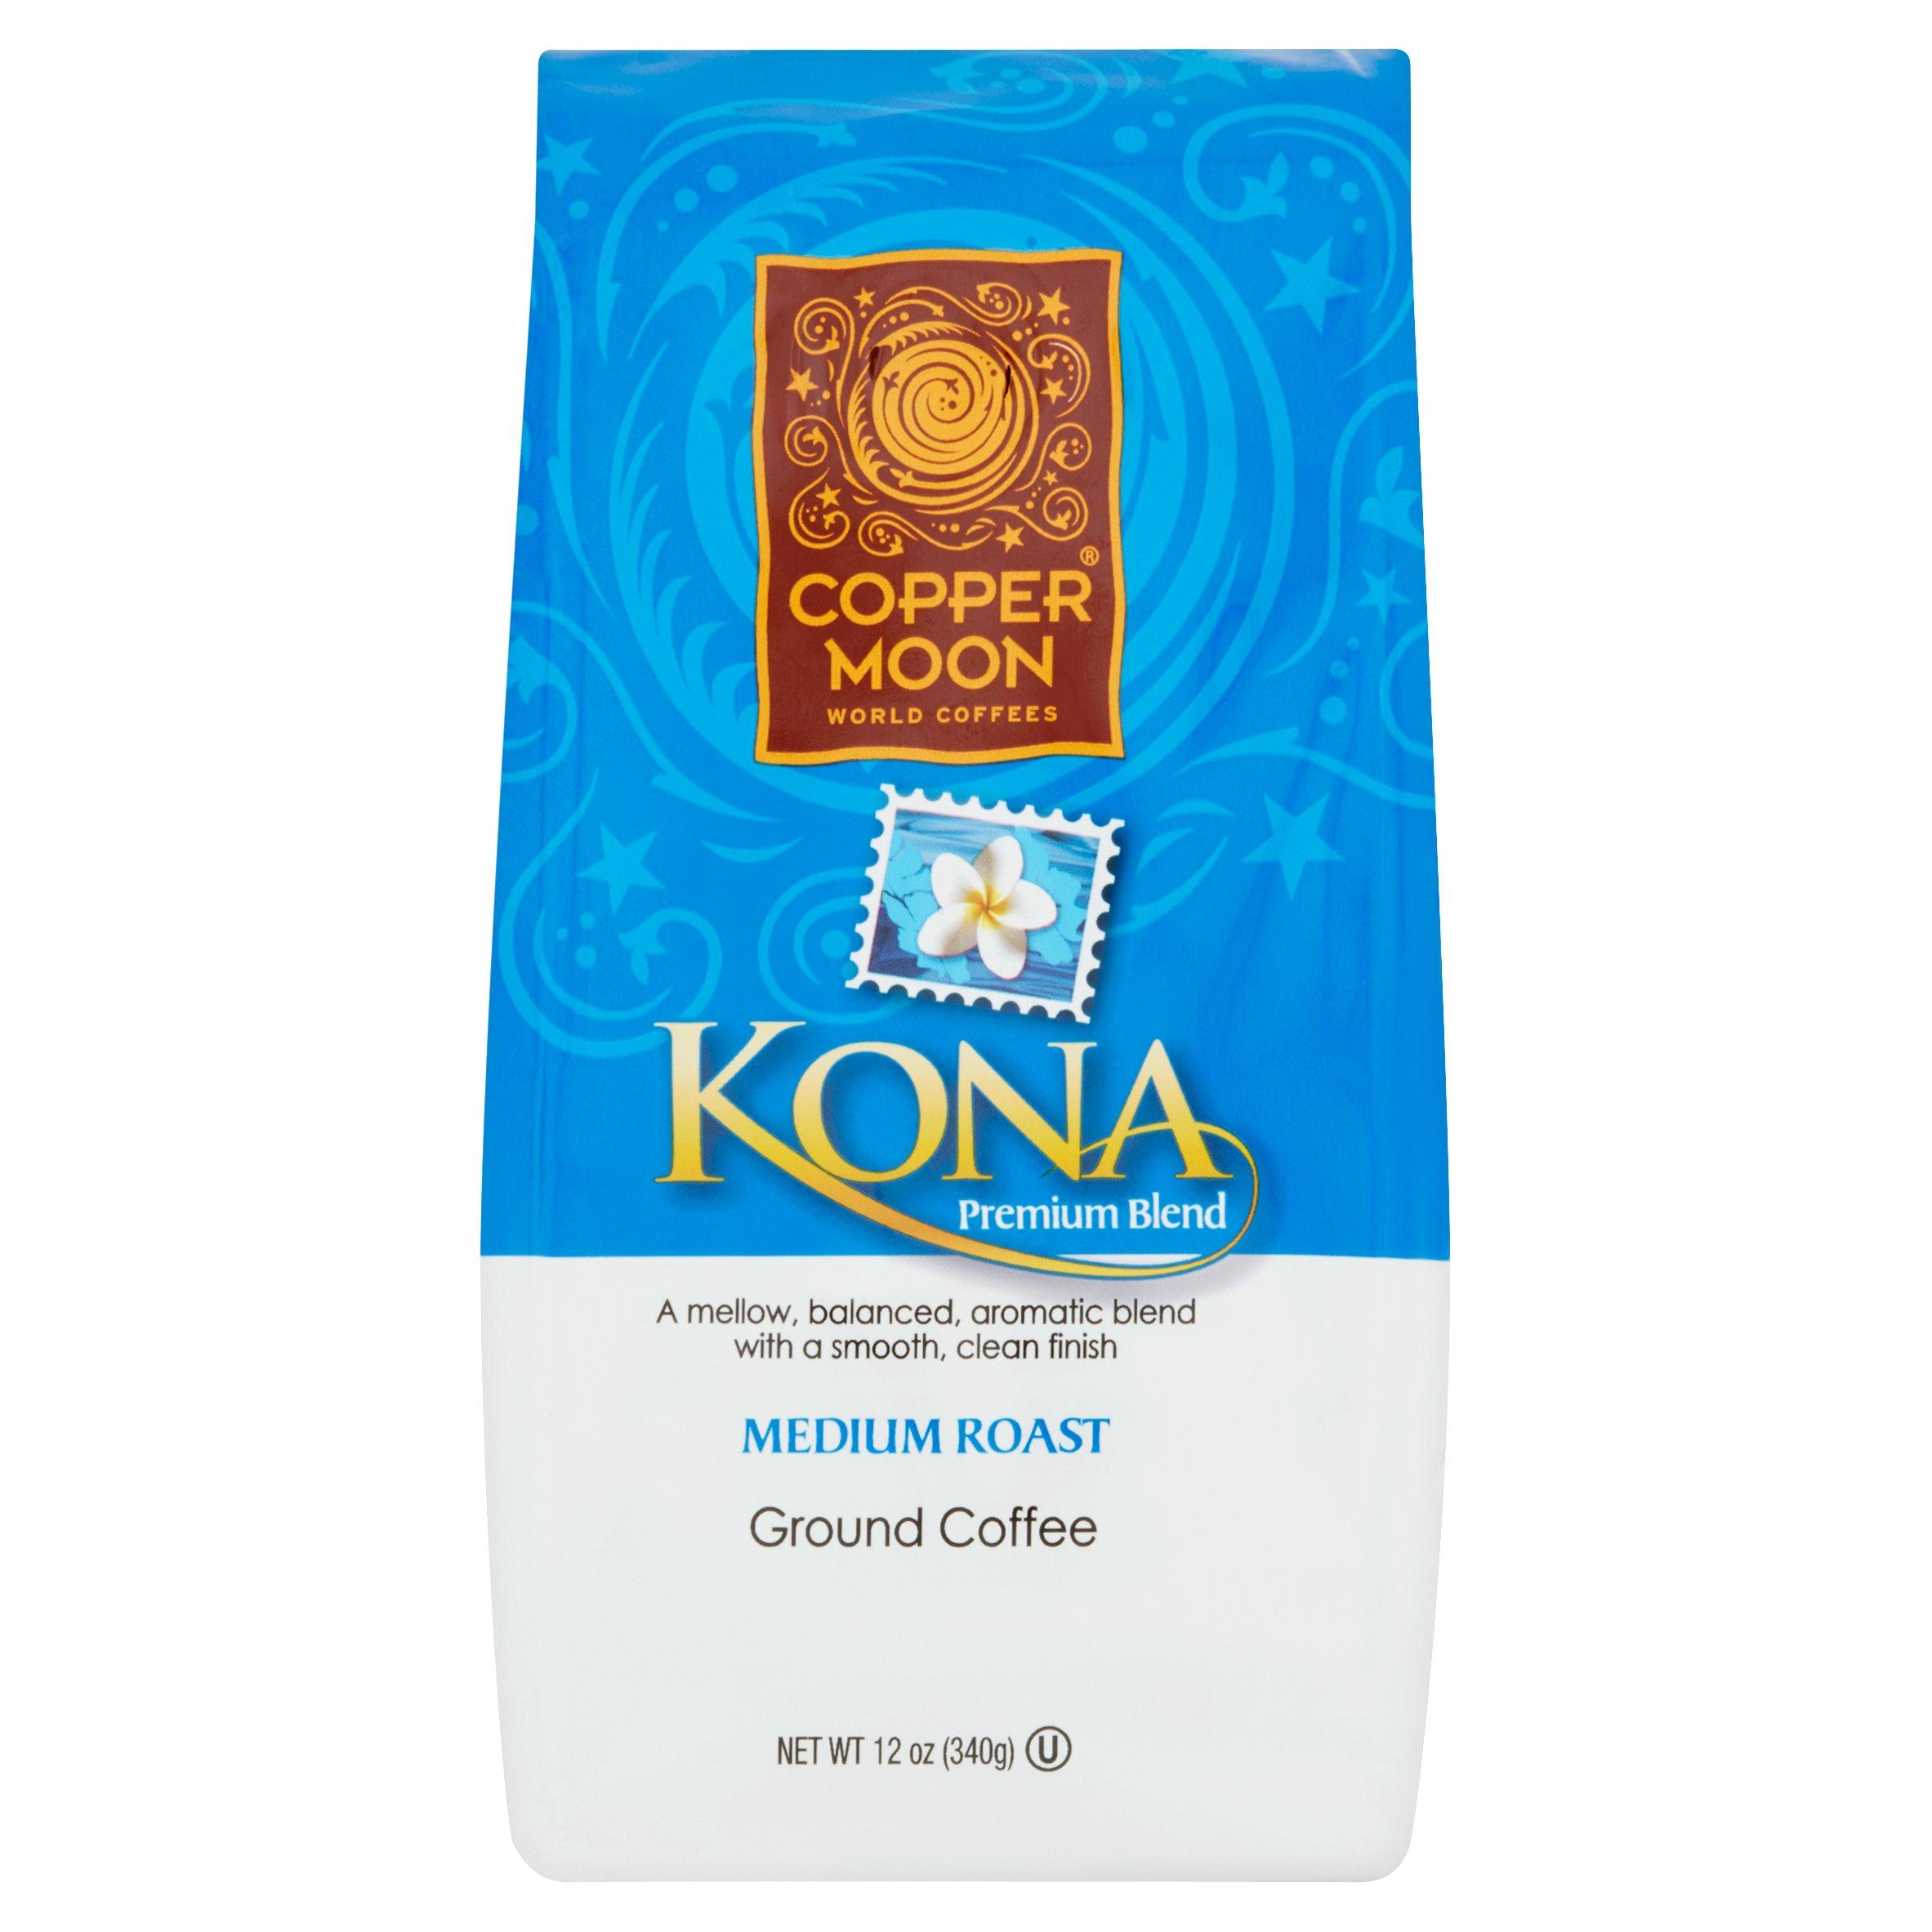 Copper Moon World Coffees Kona Premium Blend Medium Roast Ground Coffee, 12 oz